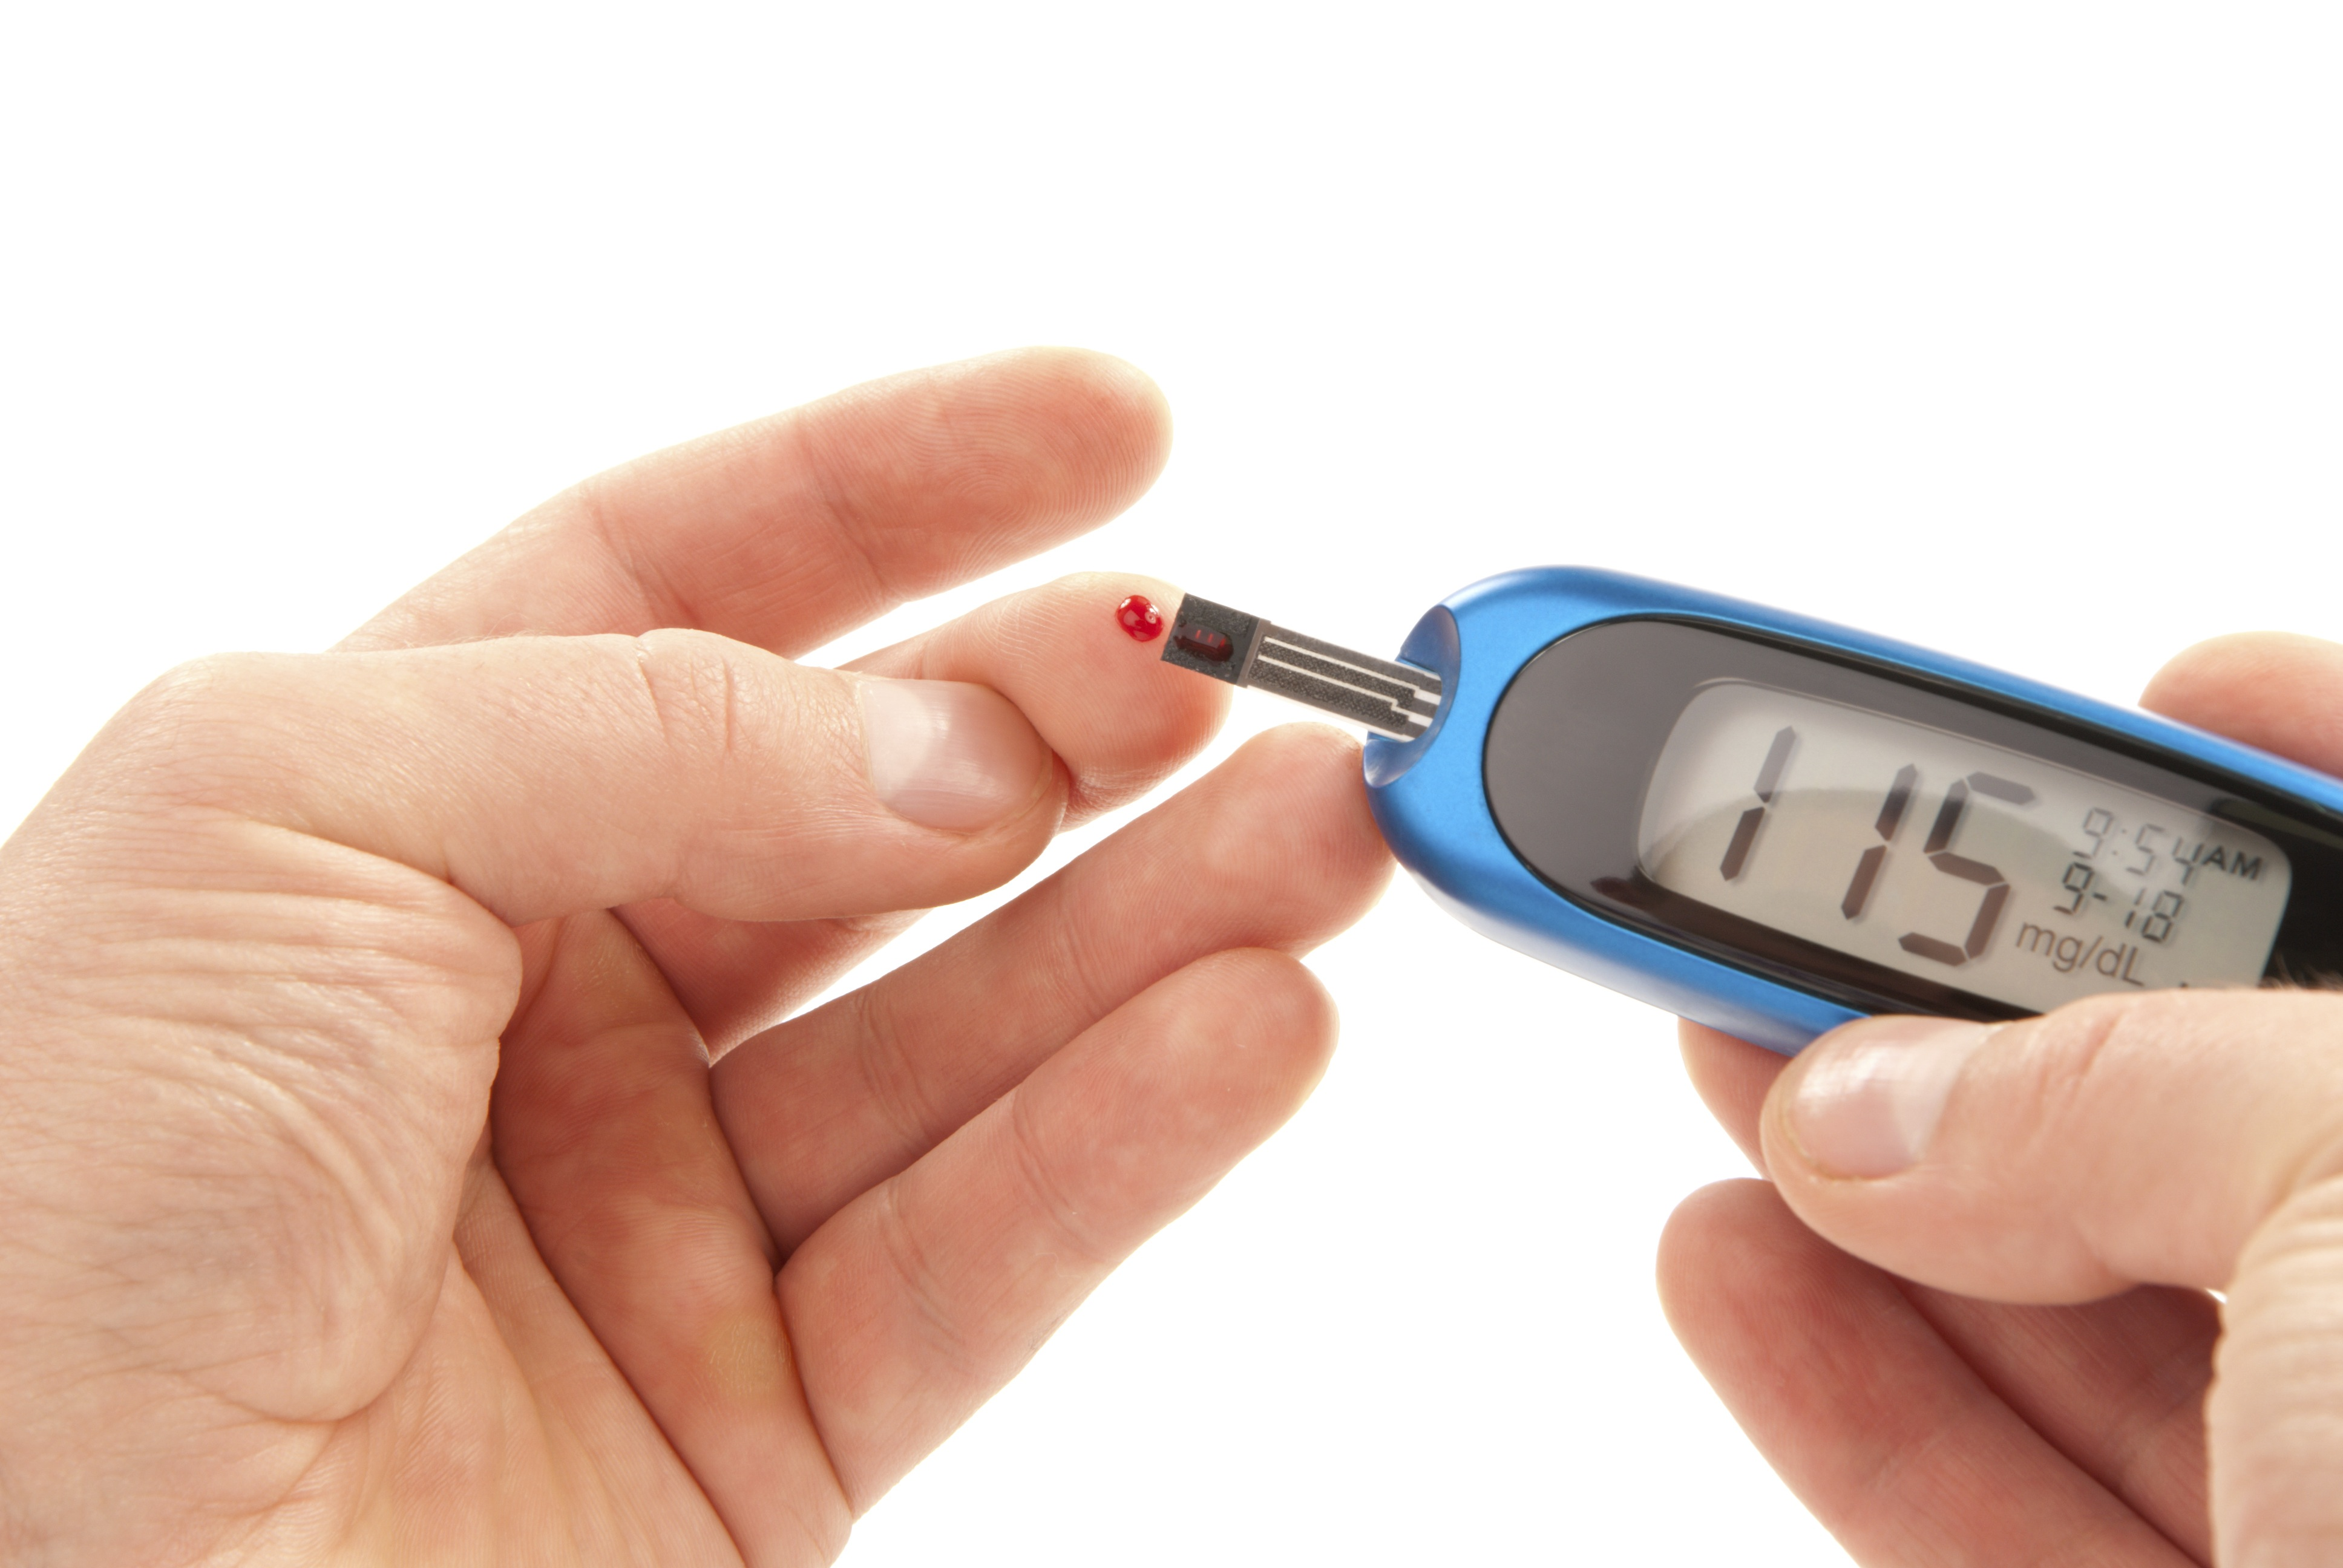 Científicos usan láser para medir glucosa